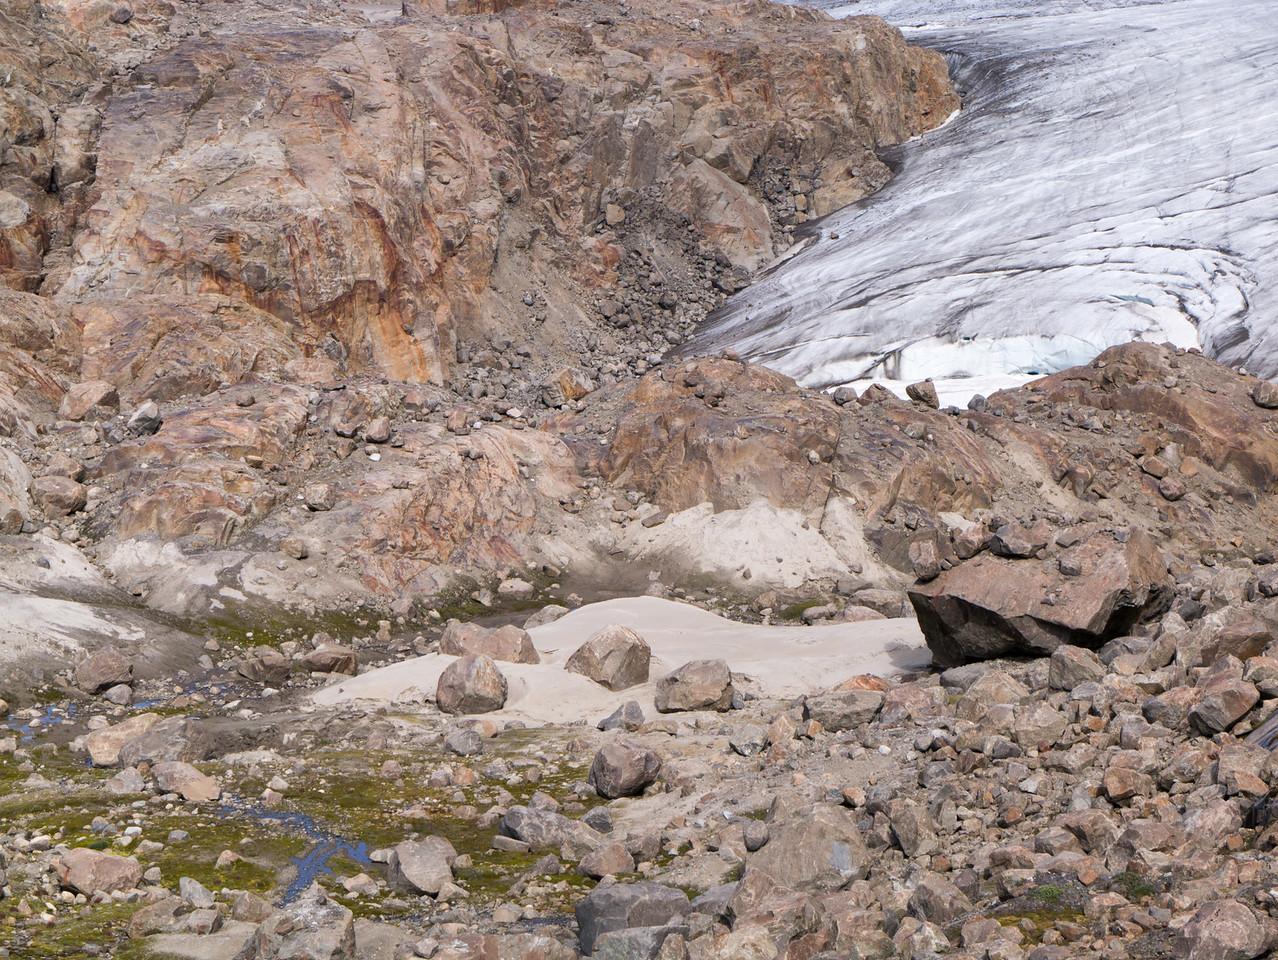 Rock or Glacial flour forming dunes